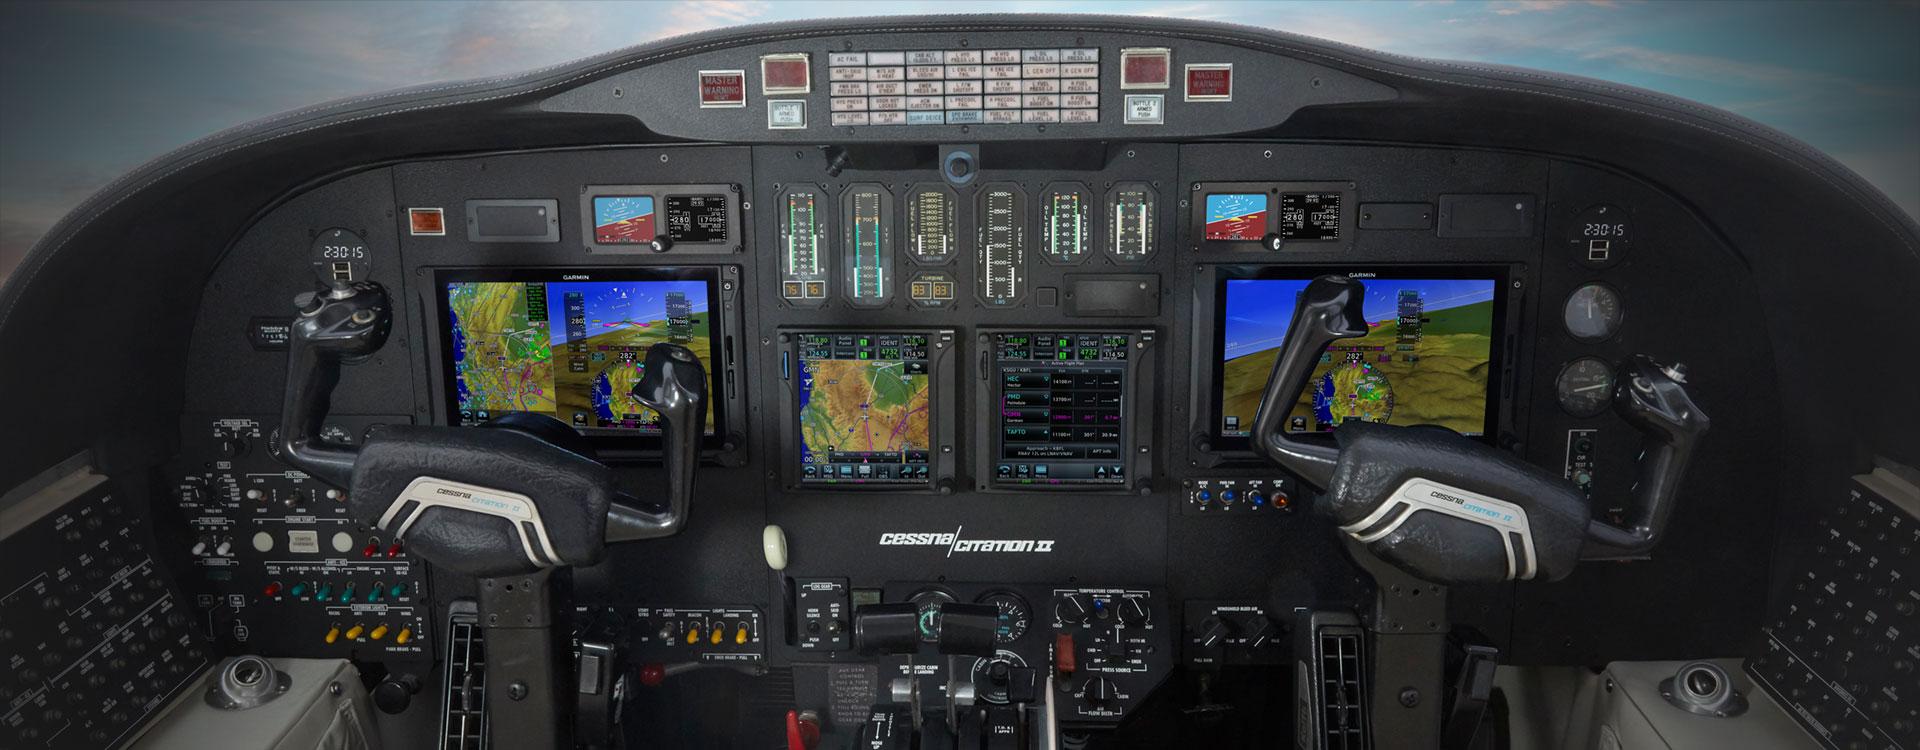 Garmin G700 TXi Cessna Citation